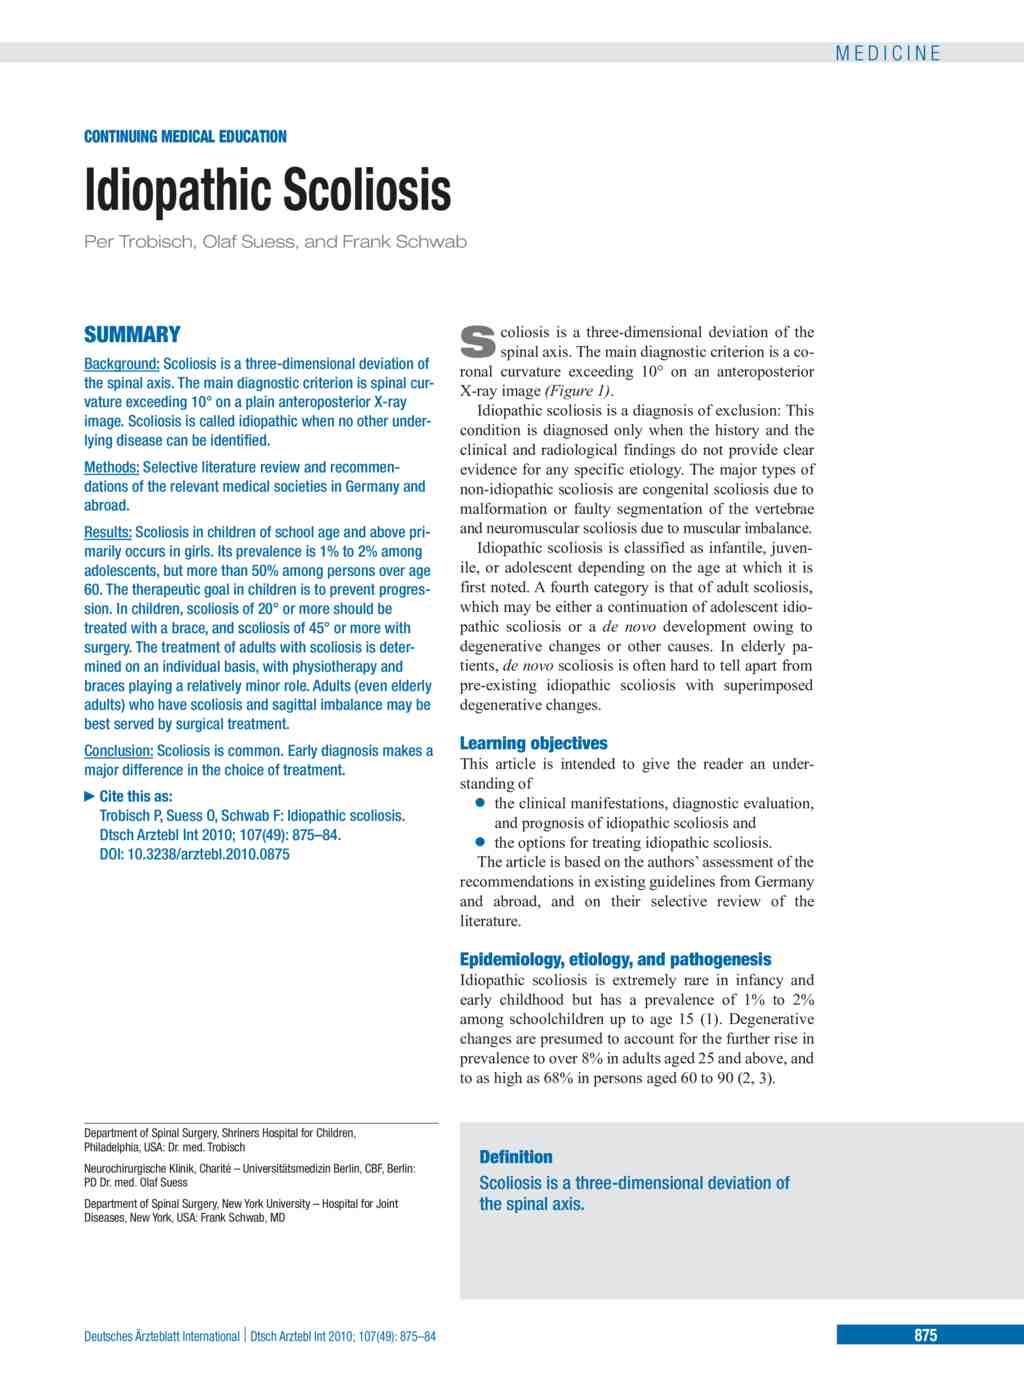 Idiopathic Scoliosis (10 12 2010)